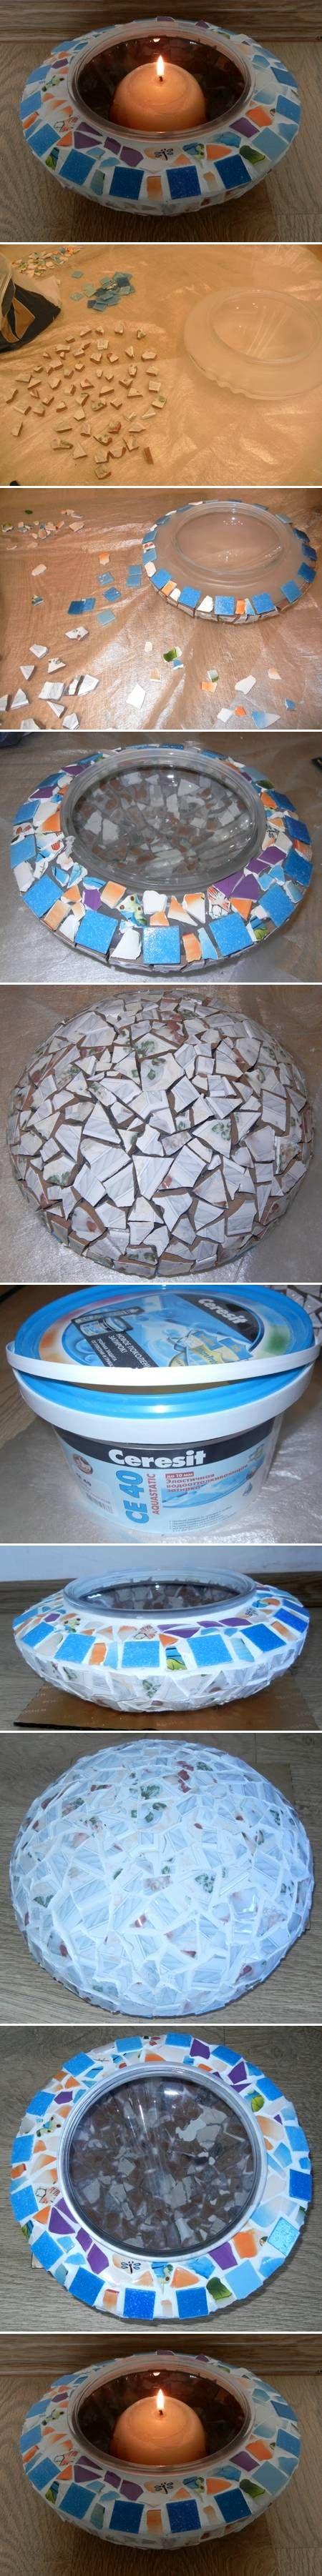 DIY Mosaic Candle Holder DIY Projects | UsefulDIY.com